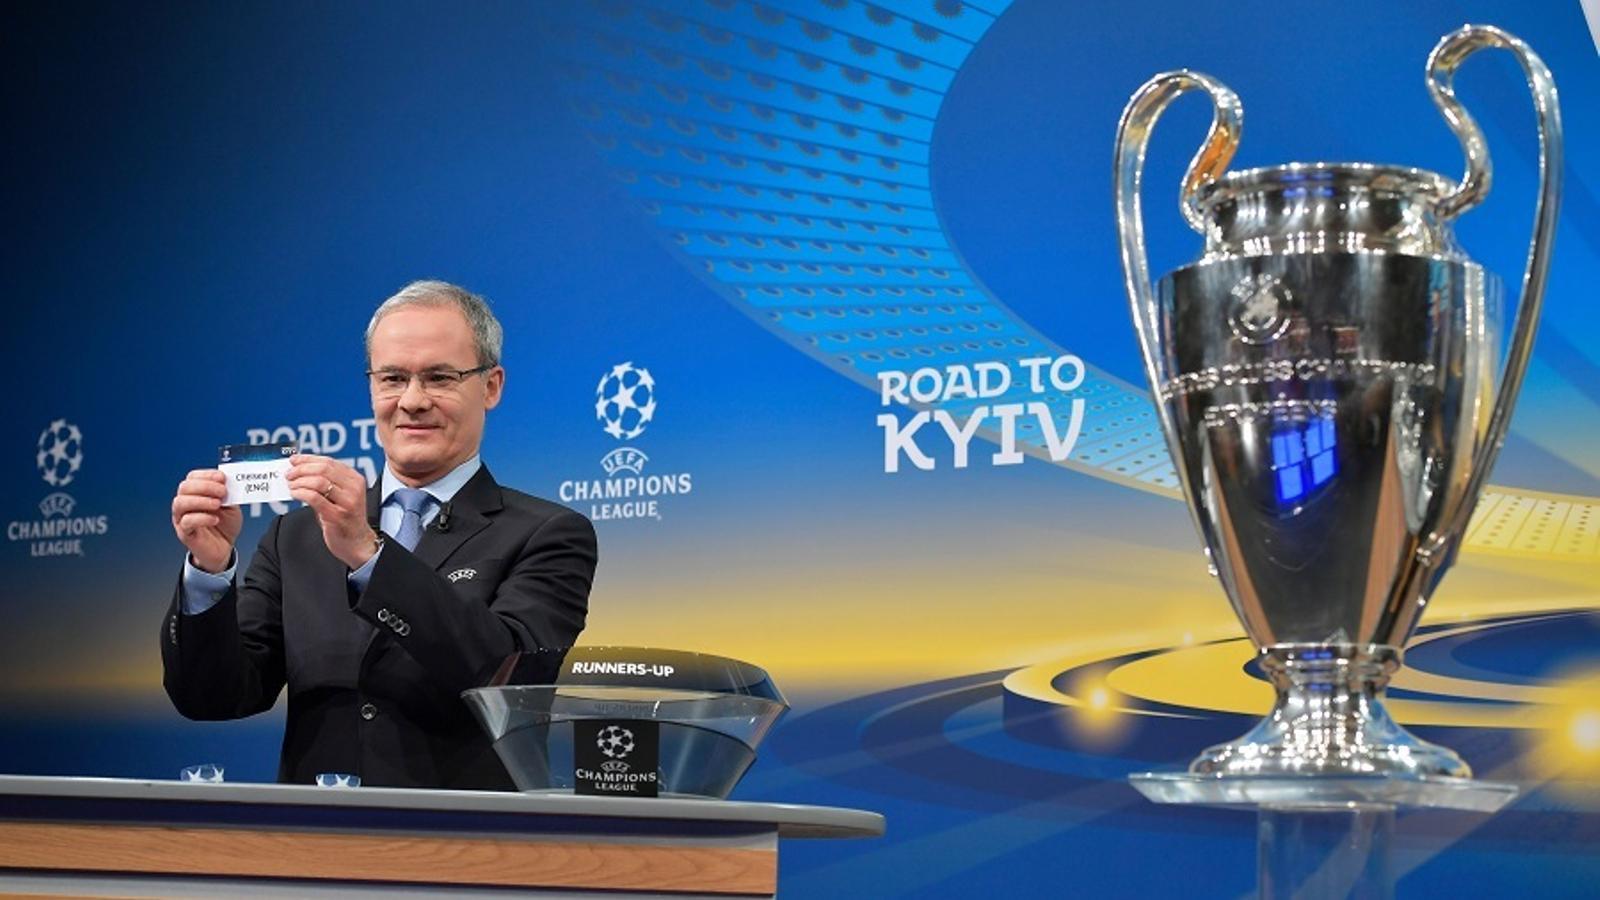 Giorgio Marchetti, director de competicions de la UEFA, treu la bola del Chelsea al sorteig